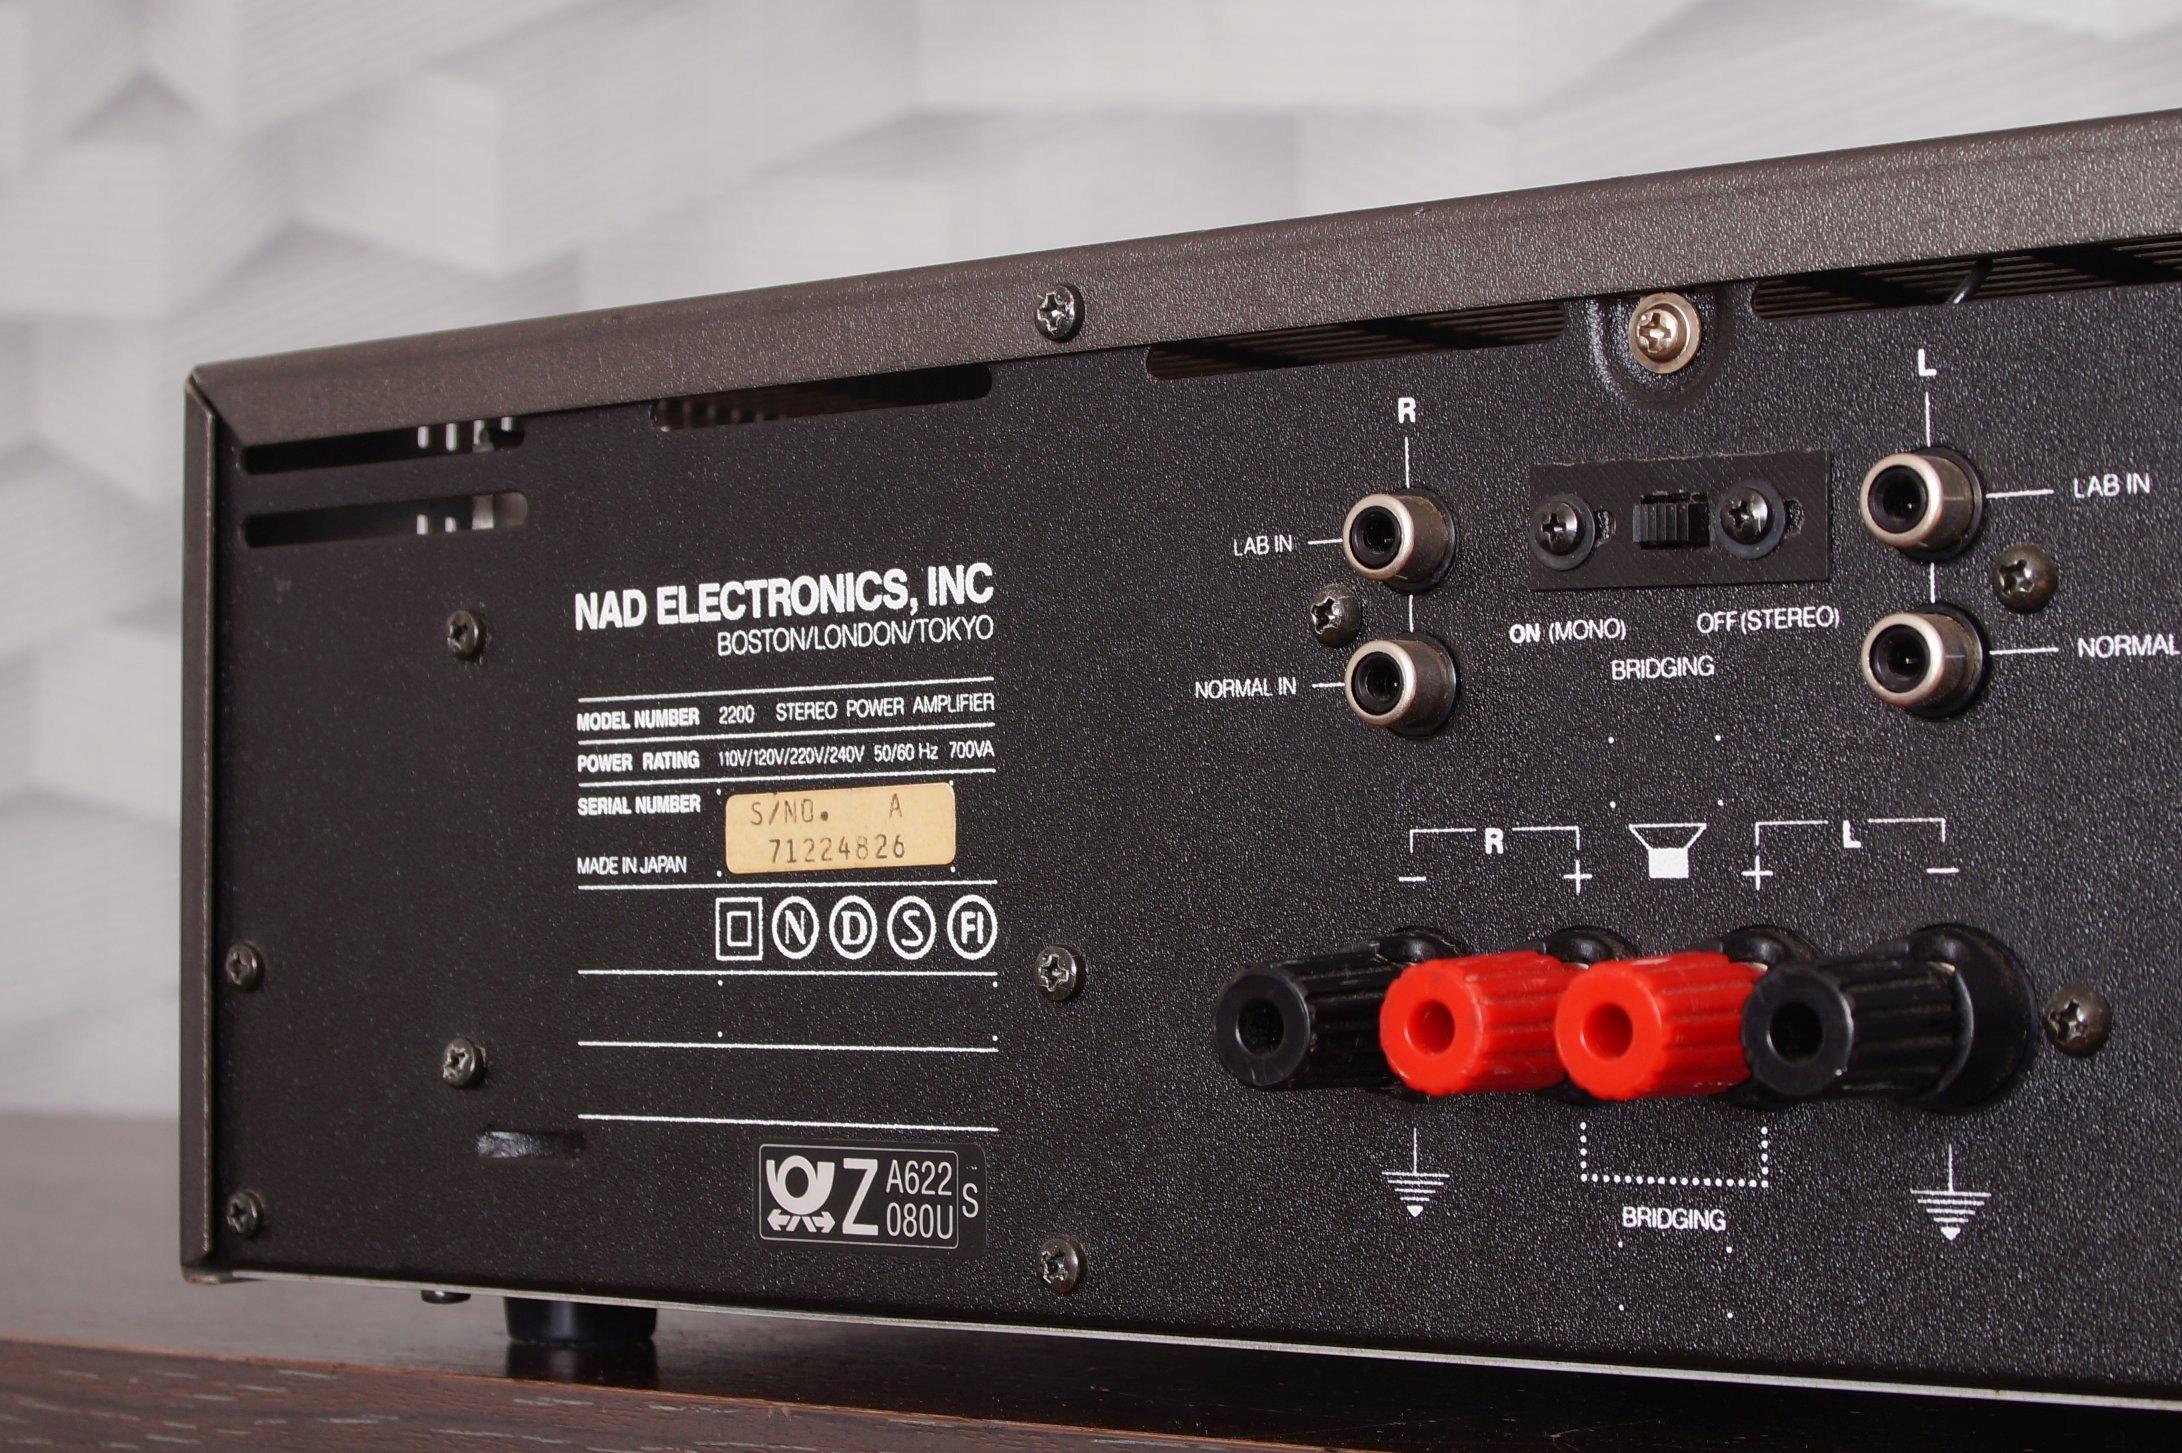 Potężna Końcówka mocy NAD 2200 komis Myślenice - 7853621388